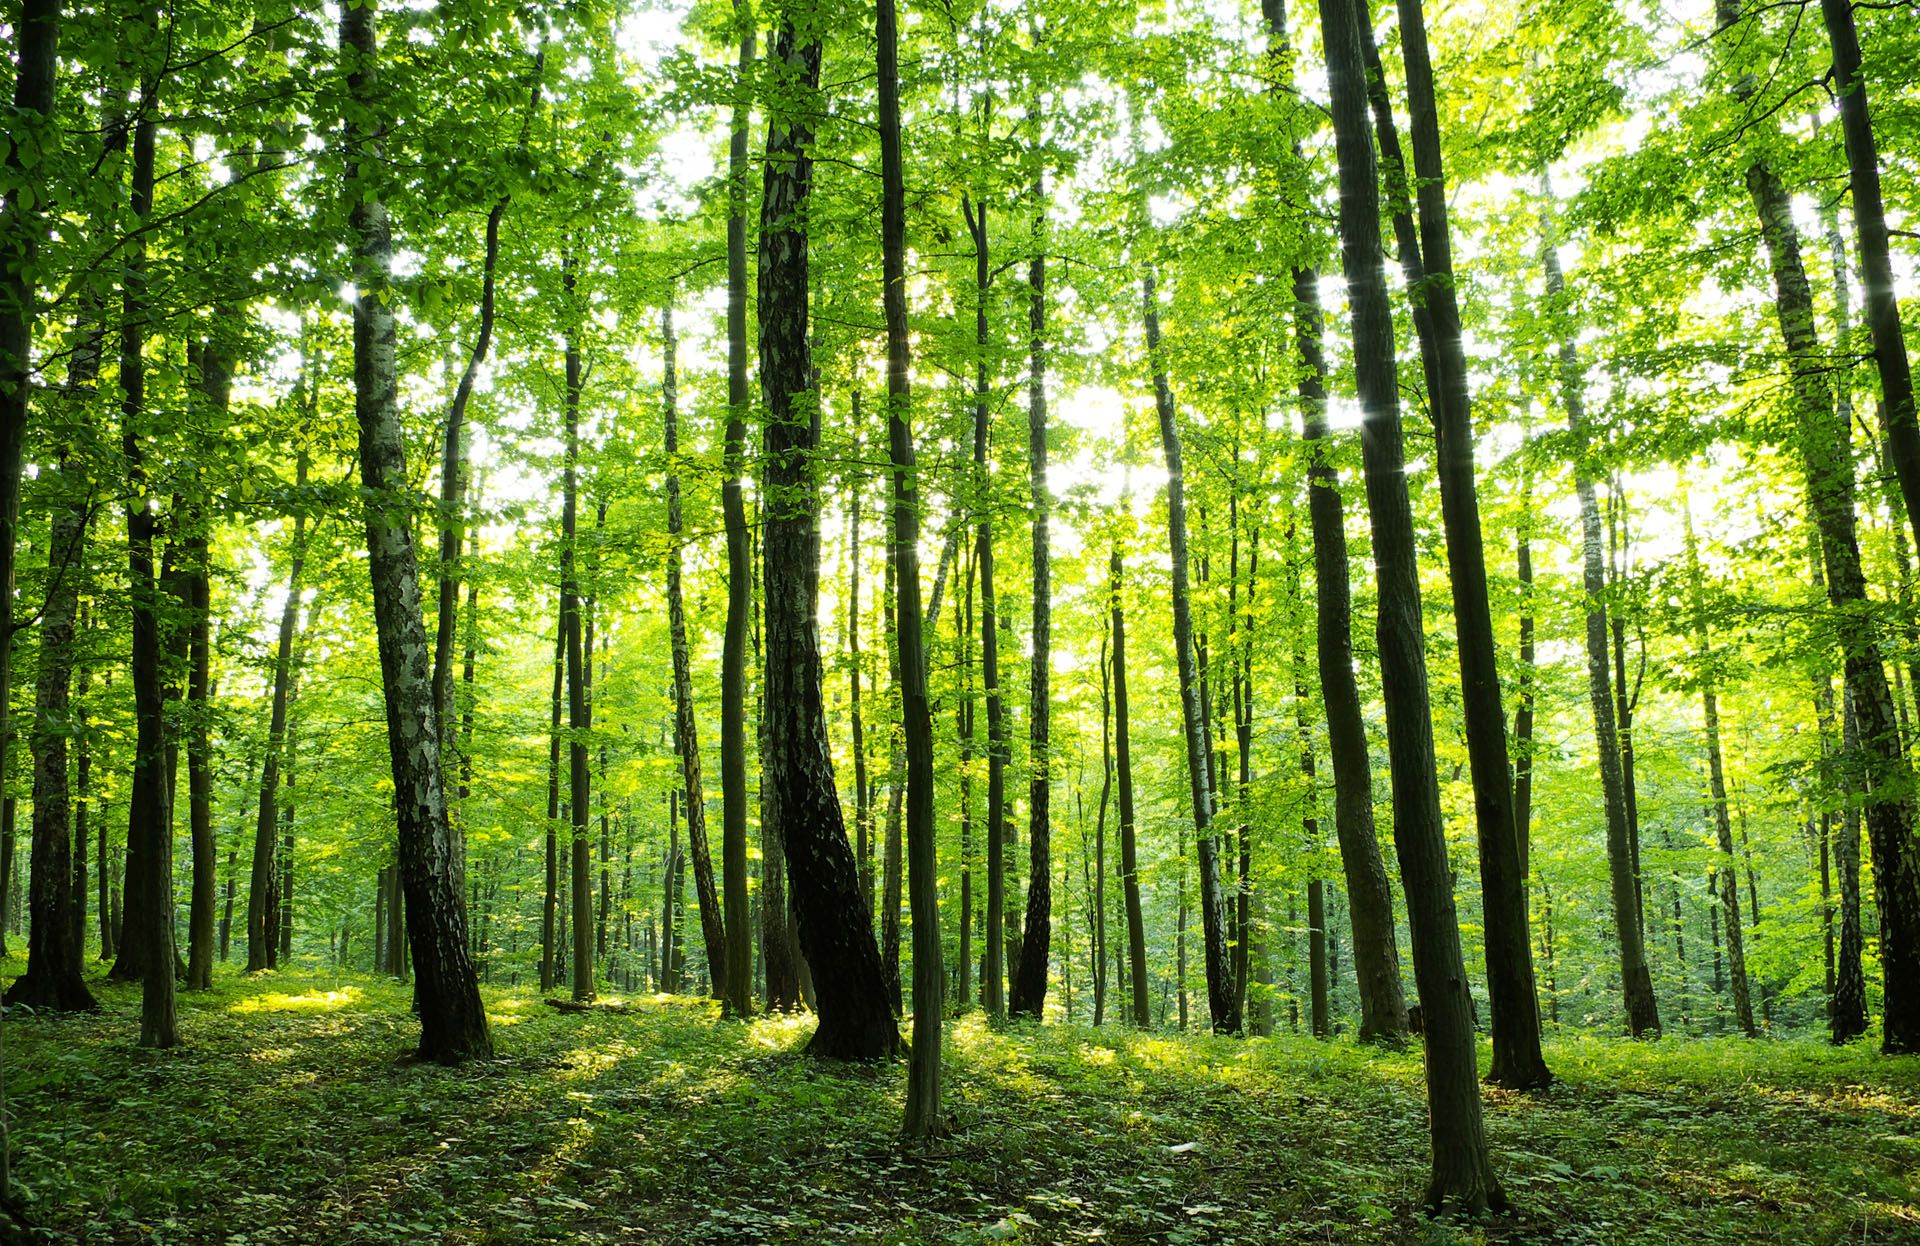 Fototapete Wald Zu Vlies Fototapete Fototapeten Tapete Tapeten Foto Wandbild Wald Fototapete Fototapete Wald Wald Tapete